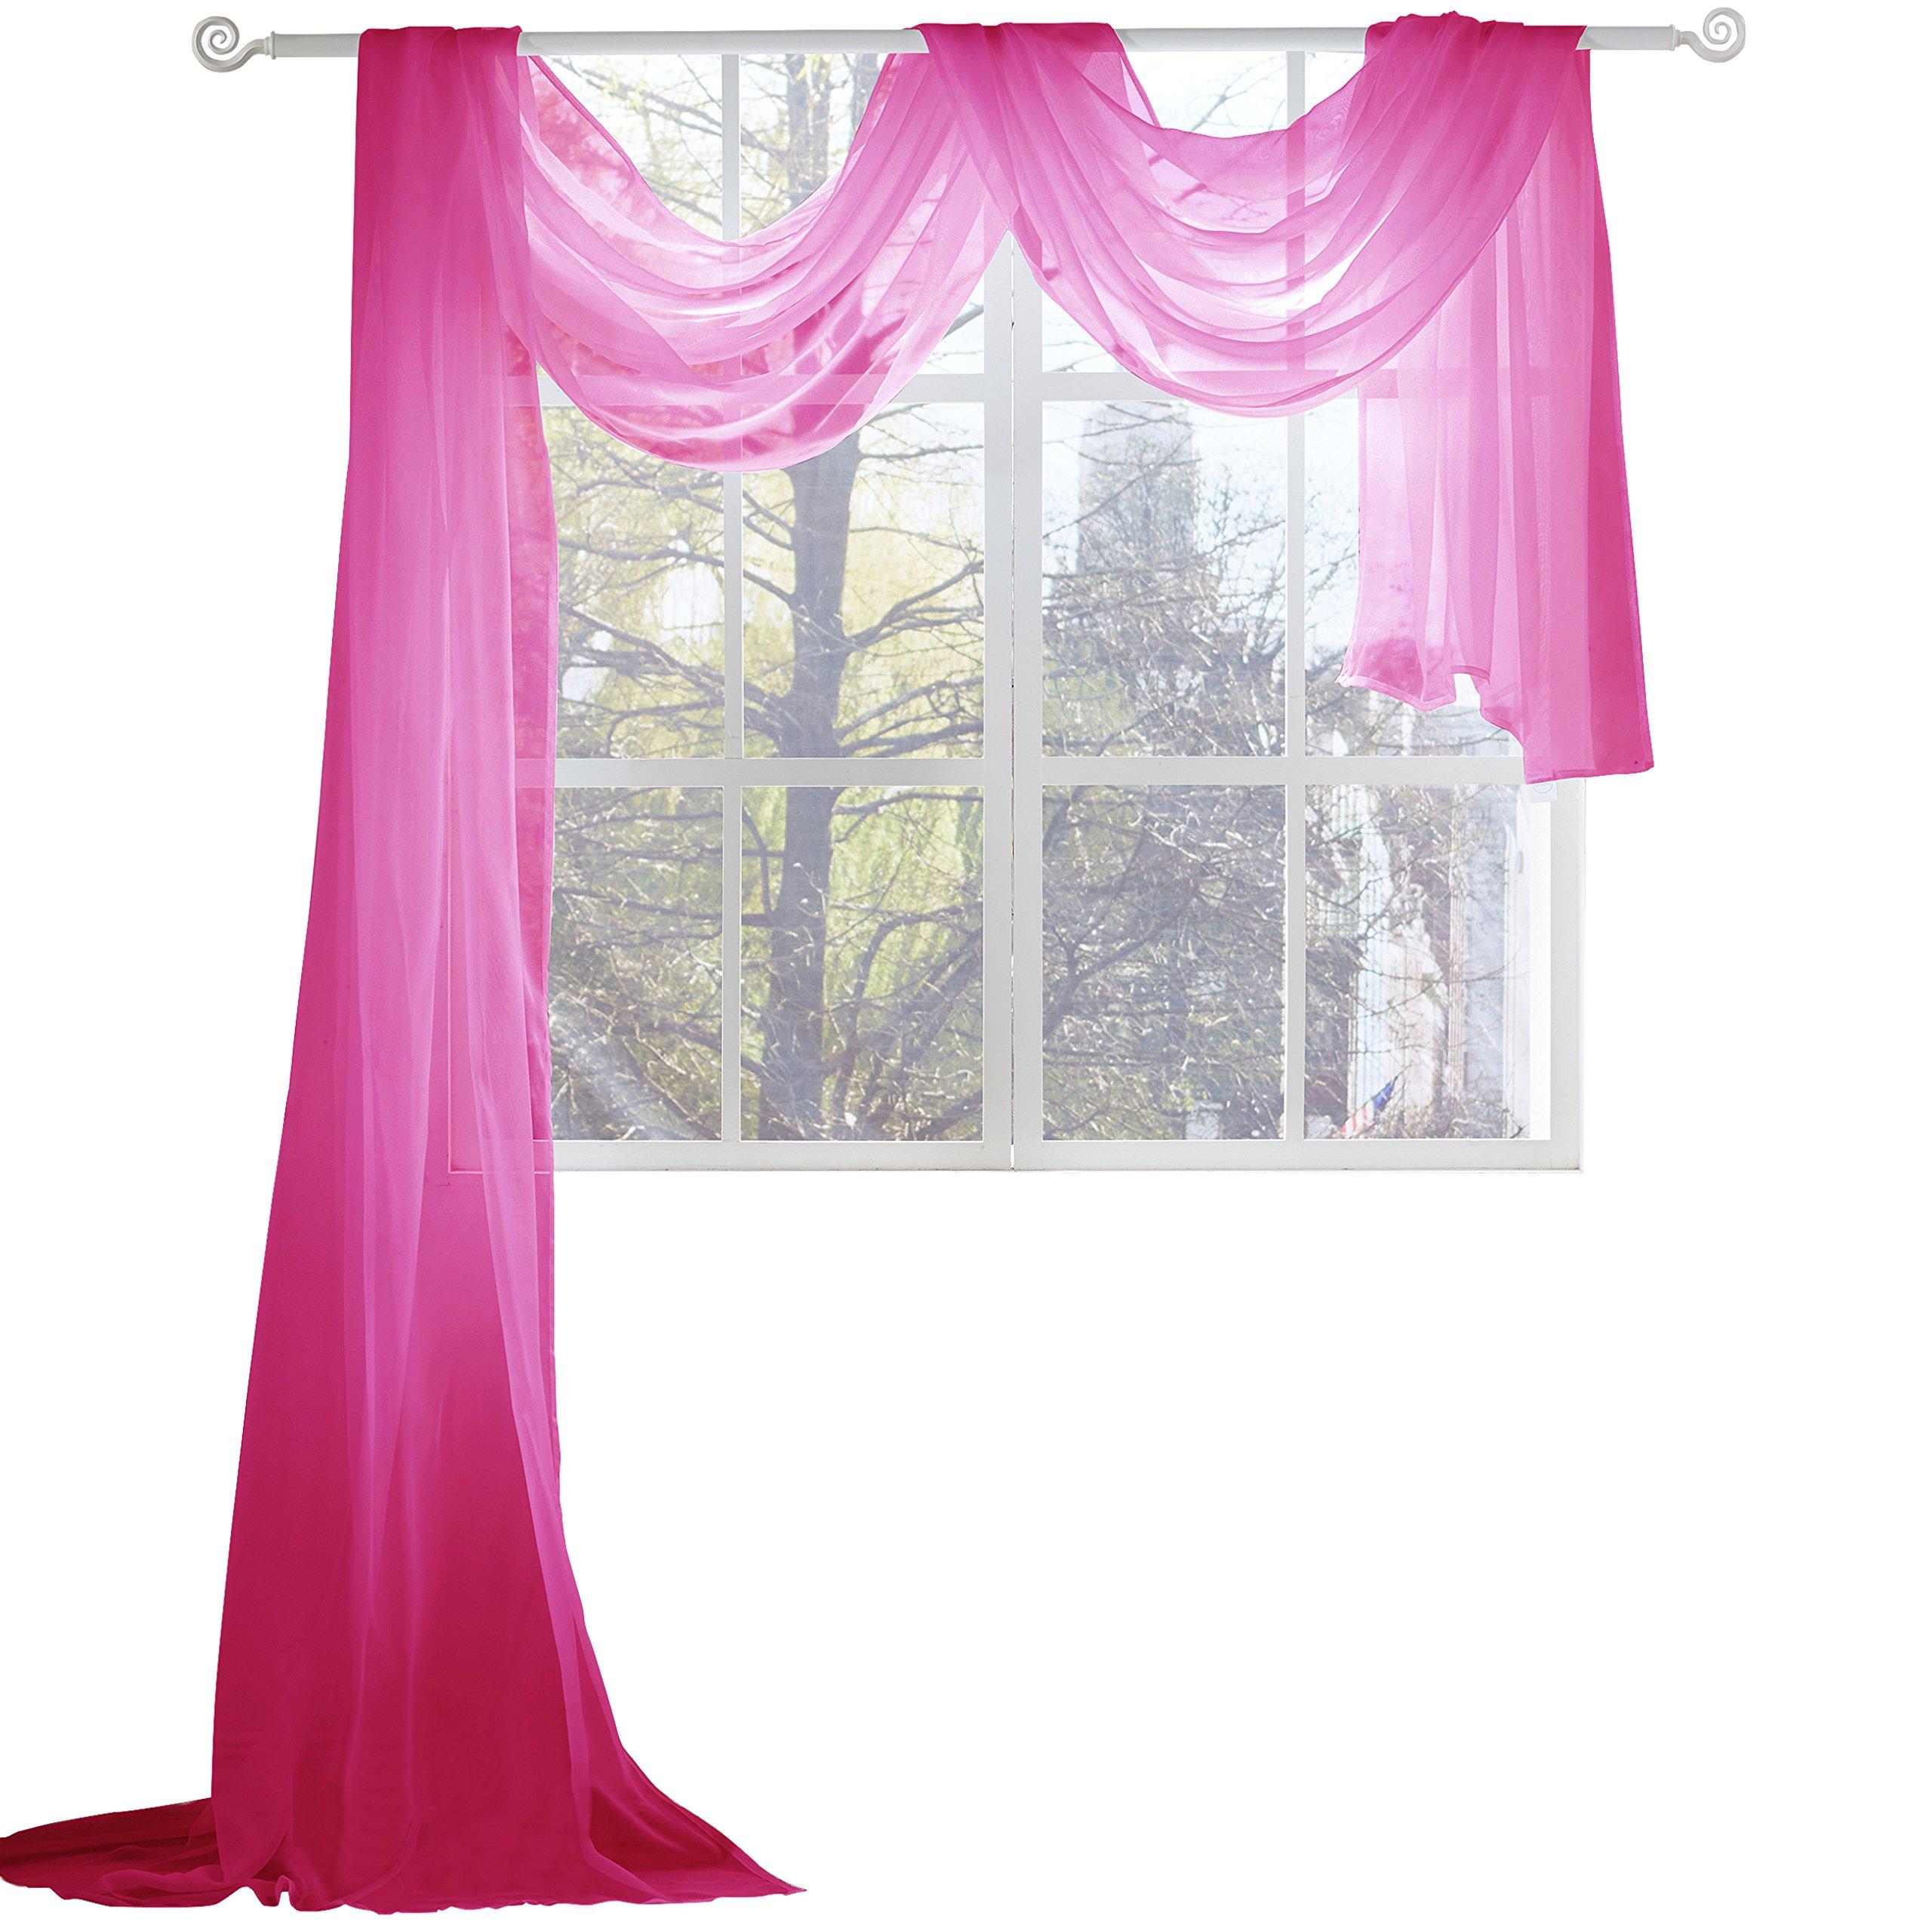 KEQIAOSUOCAI Sheer Window Scarf-Valance,52''x216'',Hot Pink